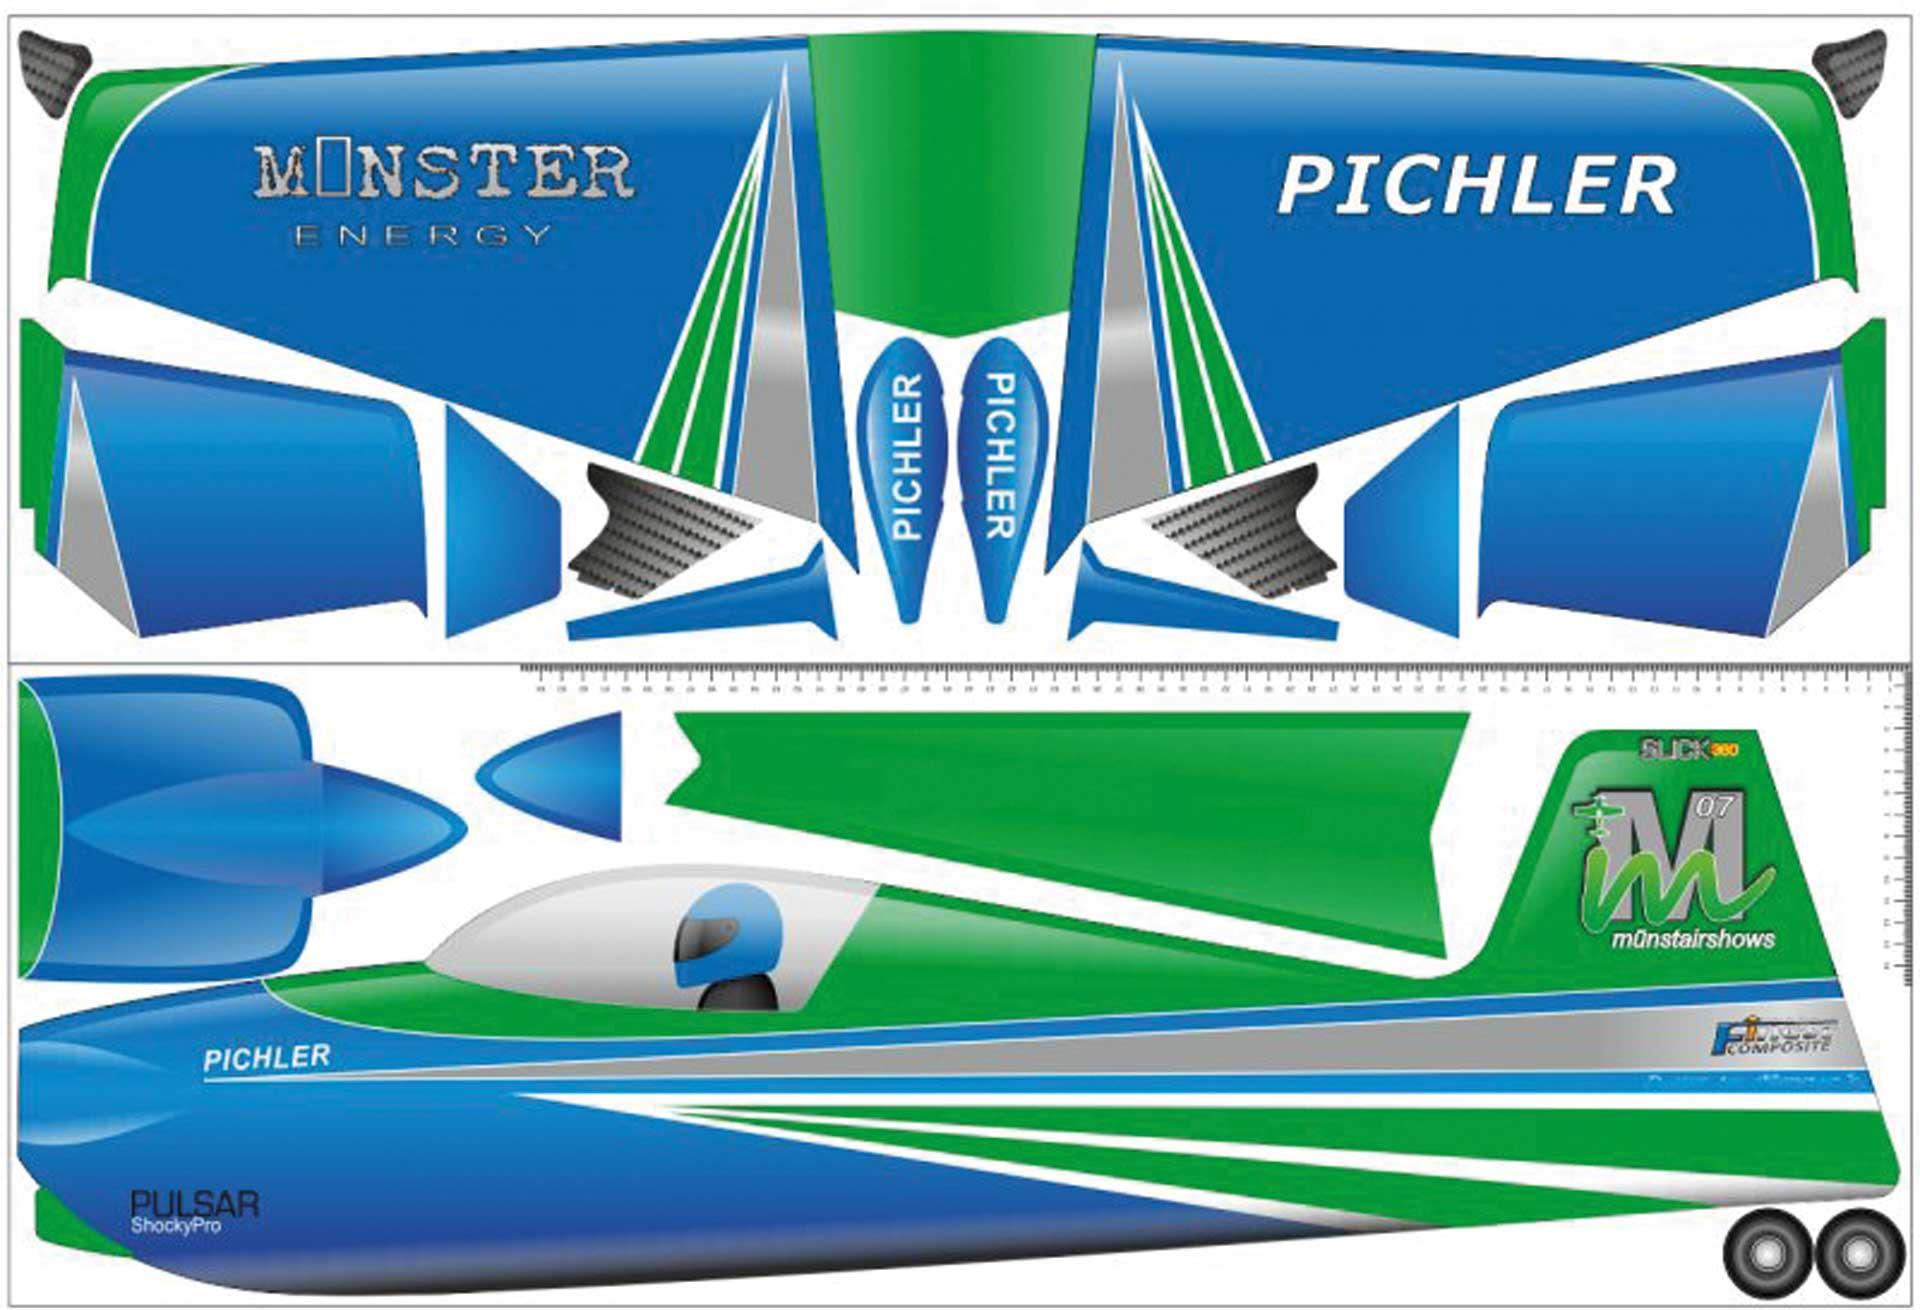 PICHLER Slick 360 (grün) Combo Set / 840 mm aus Super Board